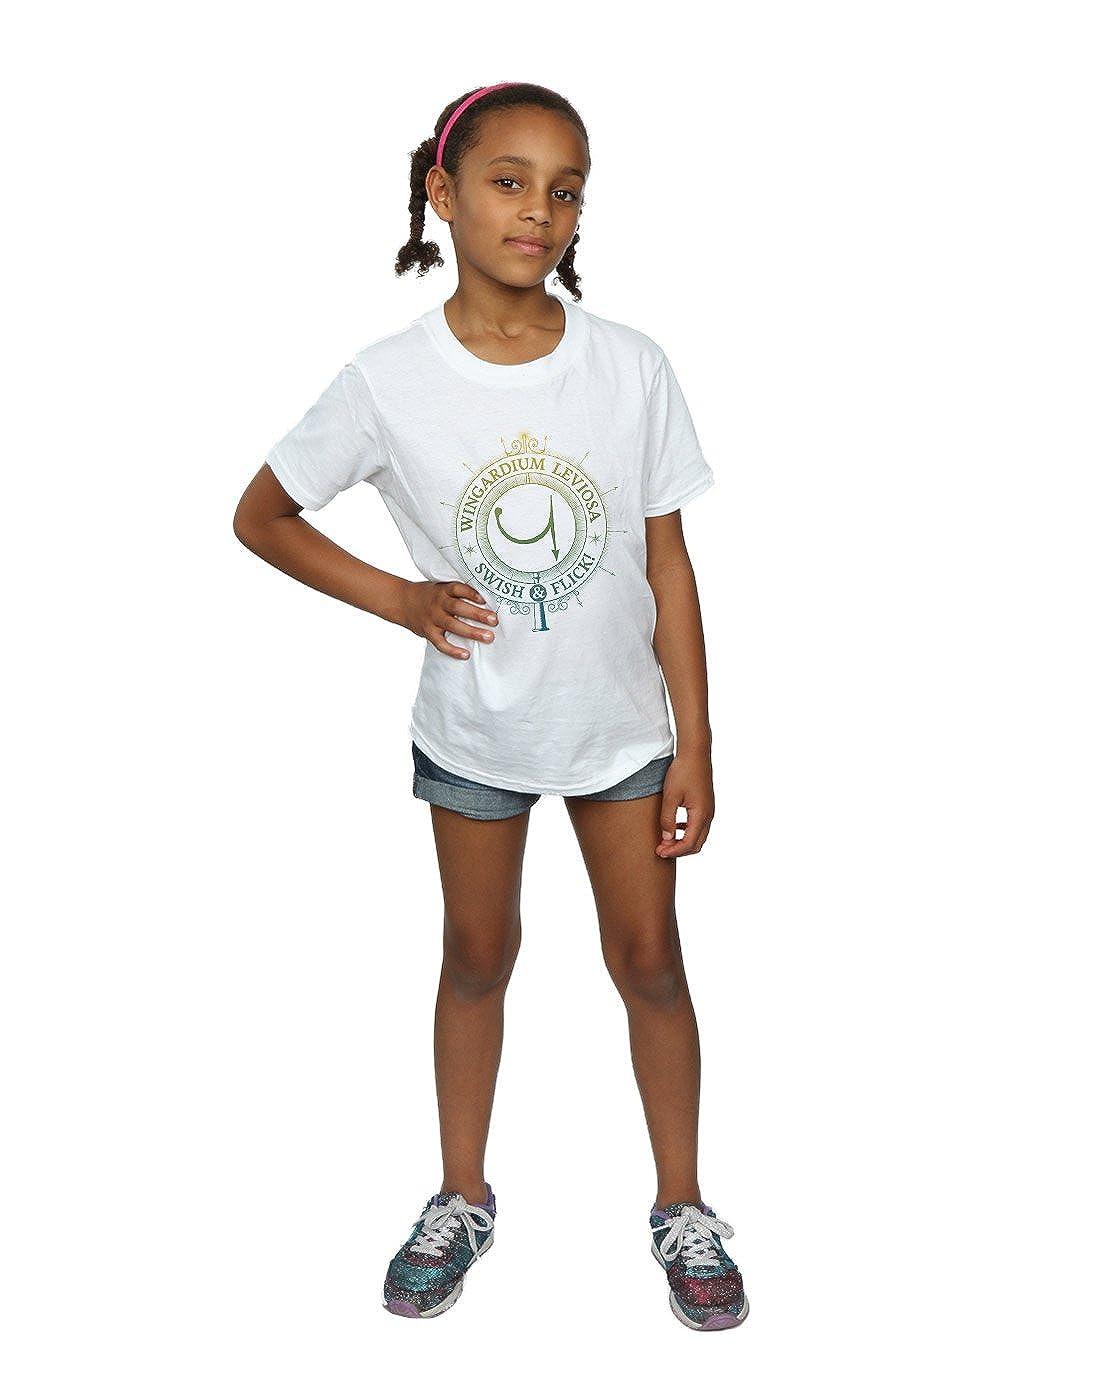 HARRY POTTER Girls Wingardium Leviosa Spells Charms T-Shirt